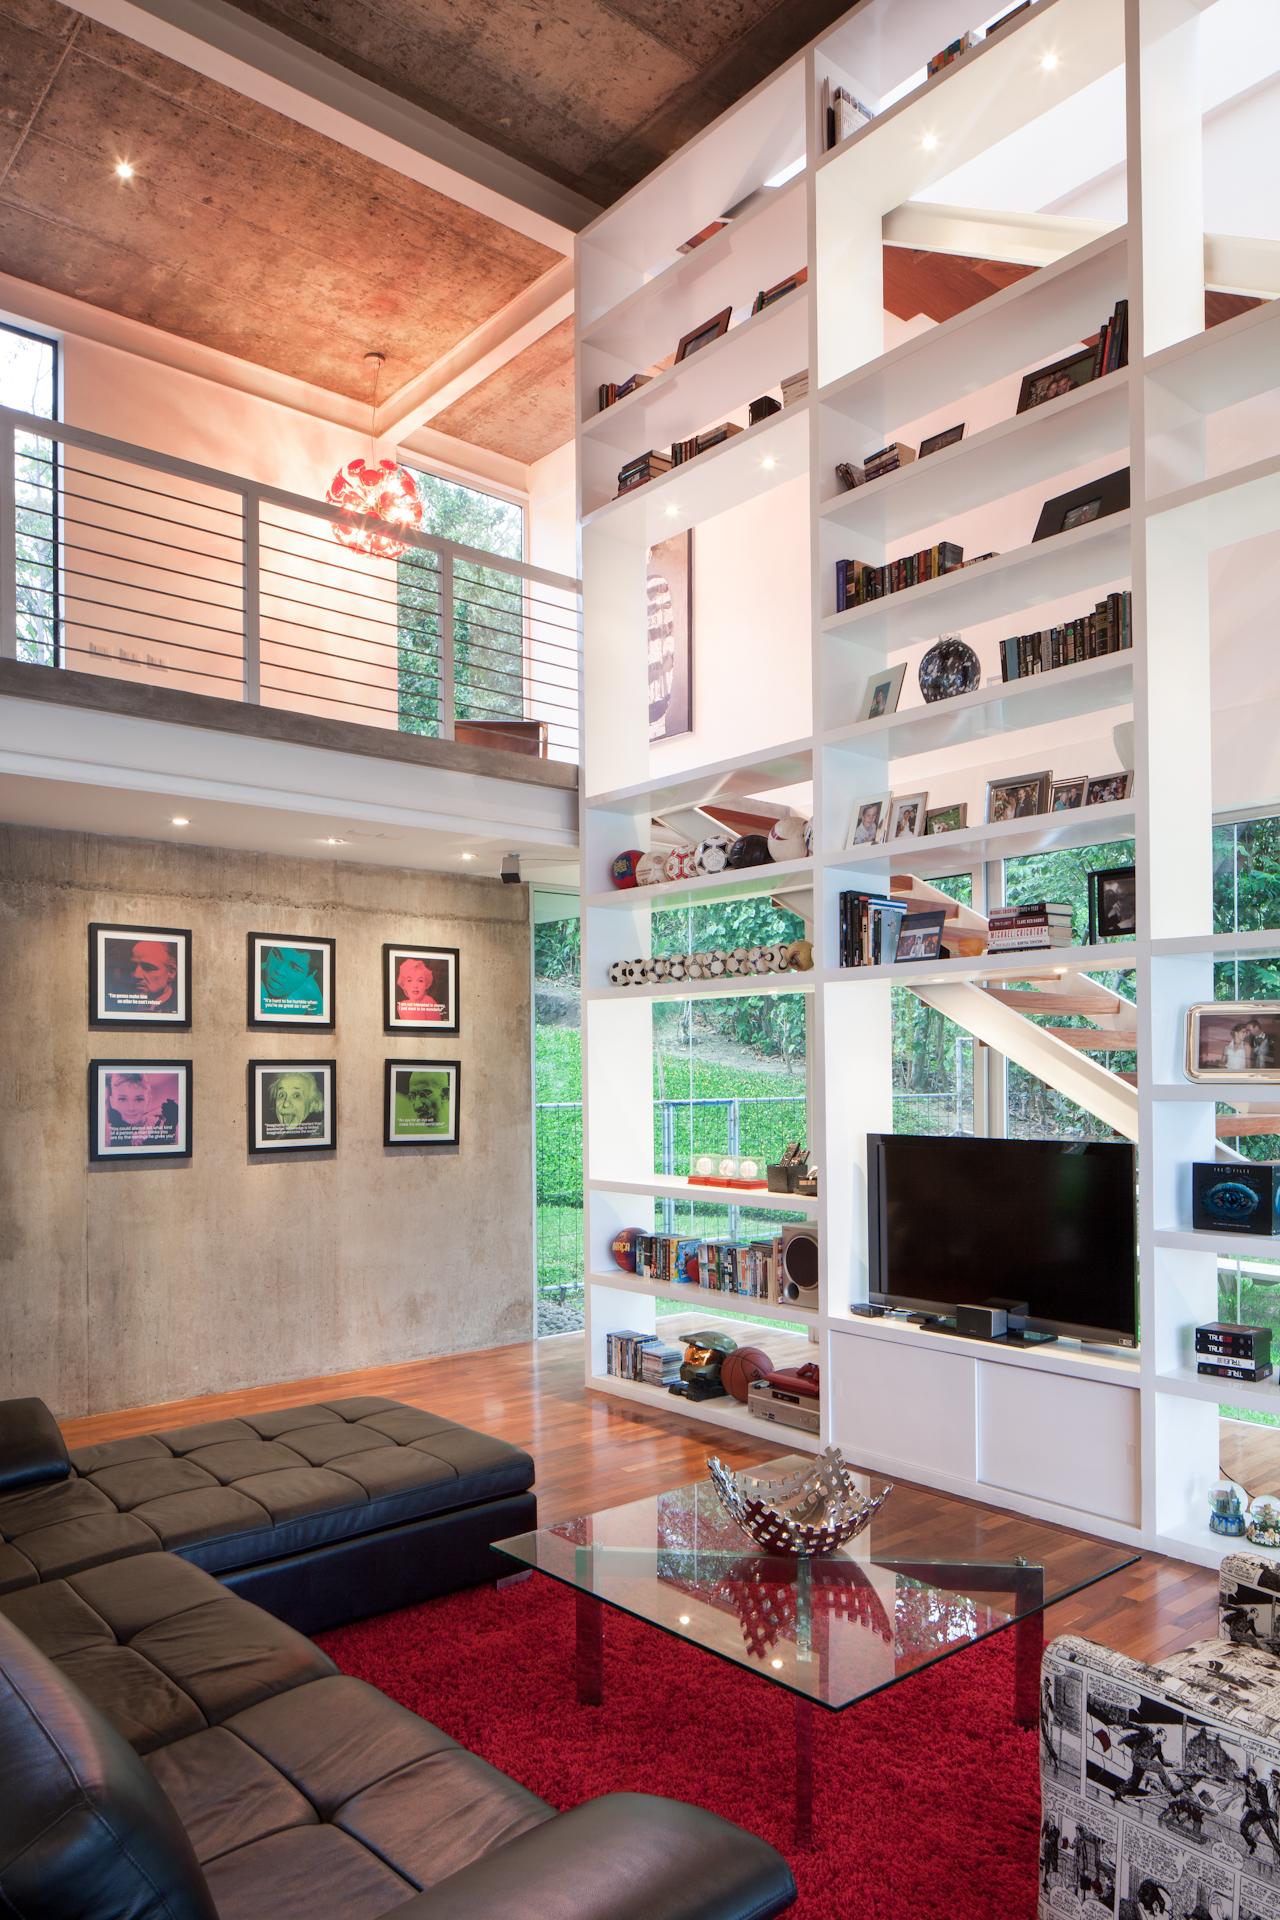 Architecture-Modern-Mi3-El-Salvador-Jason-Bax-9.JPG